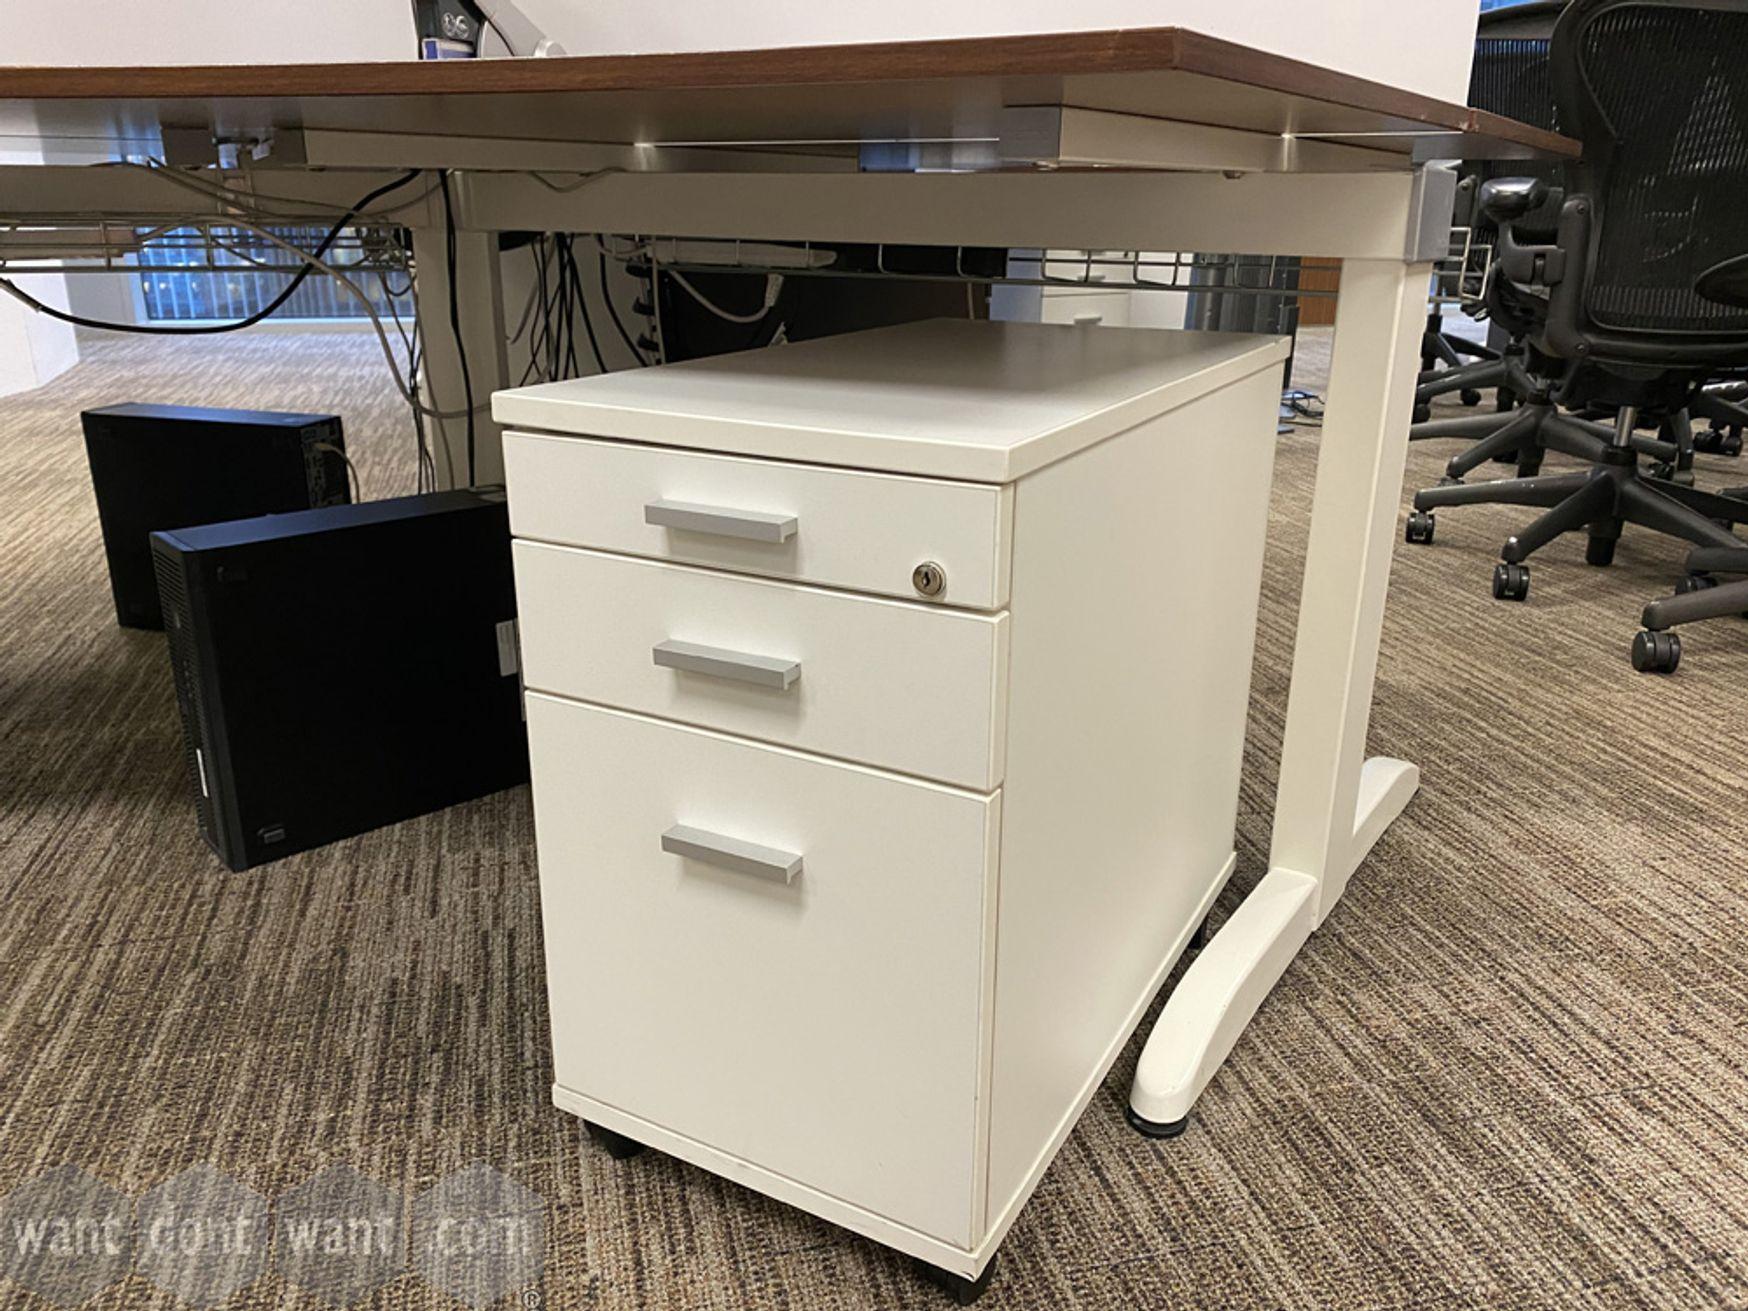 Used white slimline under-desk mobile pedestals